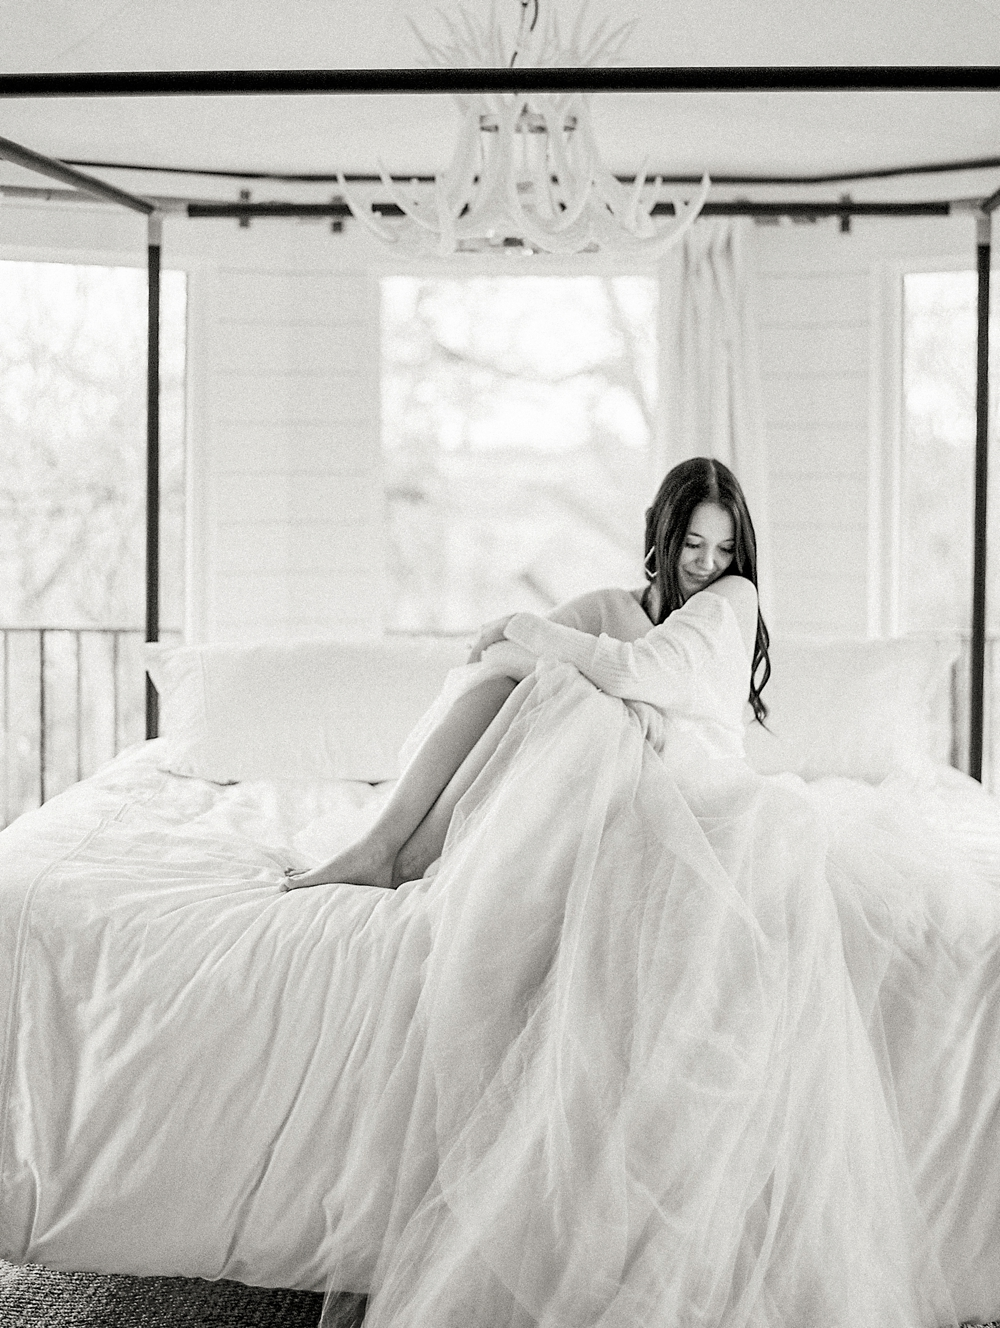 Kristin-La-Voie-Photography-fine-art-wedding-bridal-boudoir-texas-photographer-Dallas-Austin-San-Marcos-wahwahtaysee-resort-108